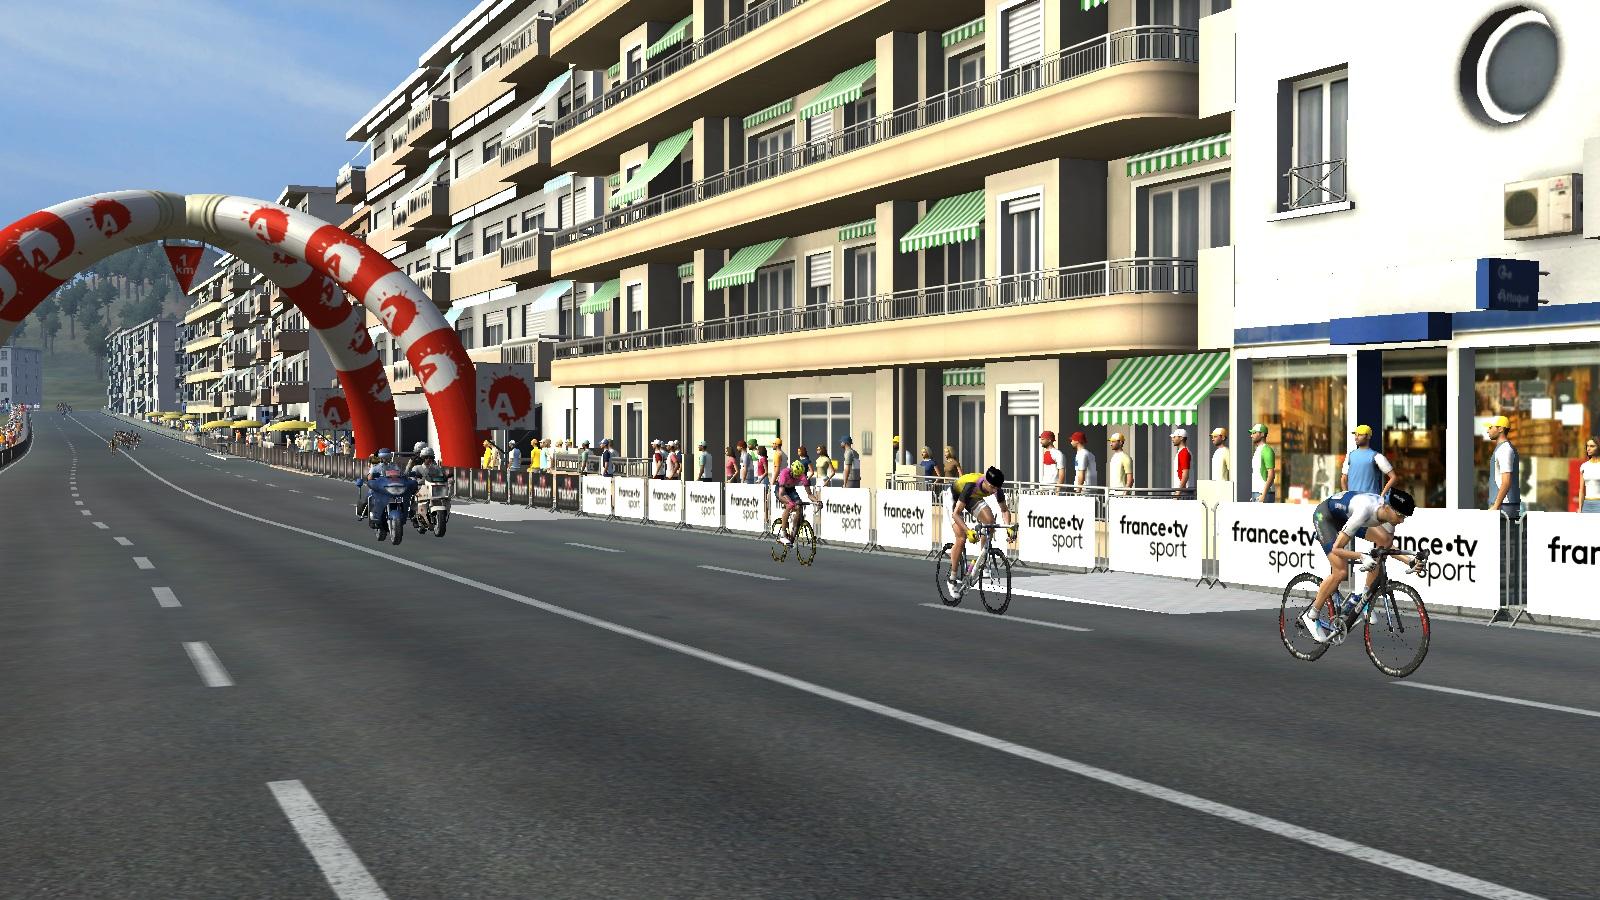 pcmdaily.com/images/mg/2019/Races/C2/Rio/58.jpg